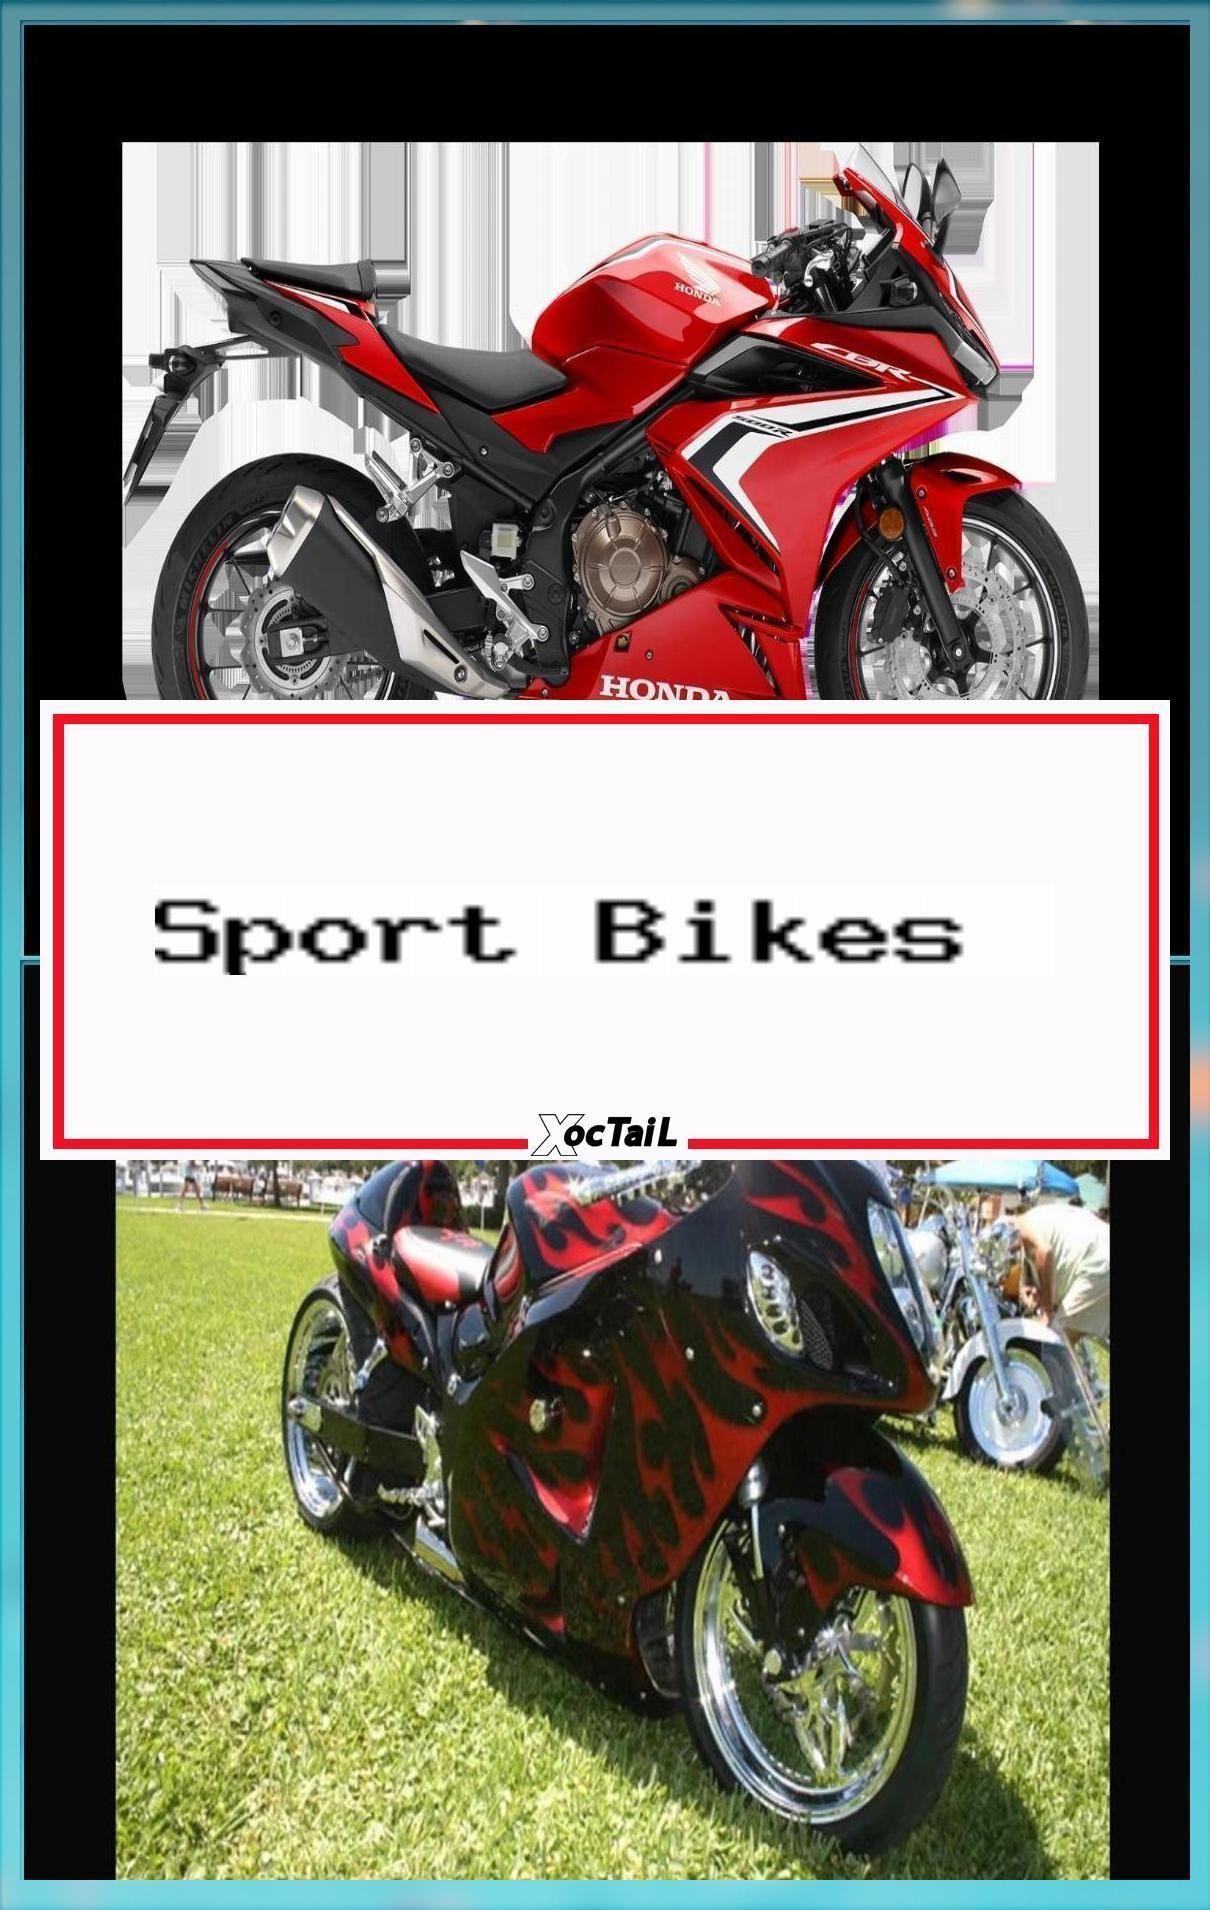 Sport Bikes Honda Motorcycles Canada Bikes Sport Custom Bike